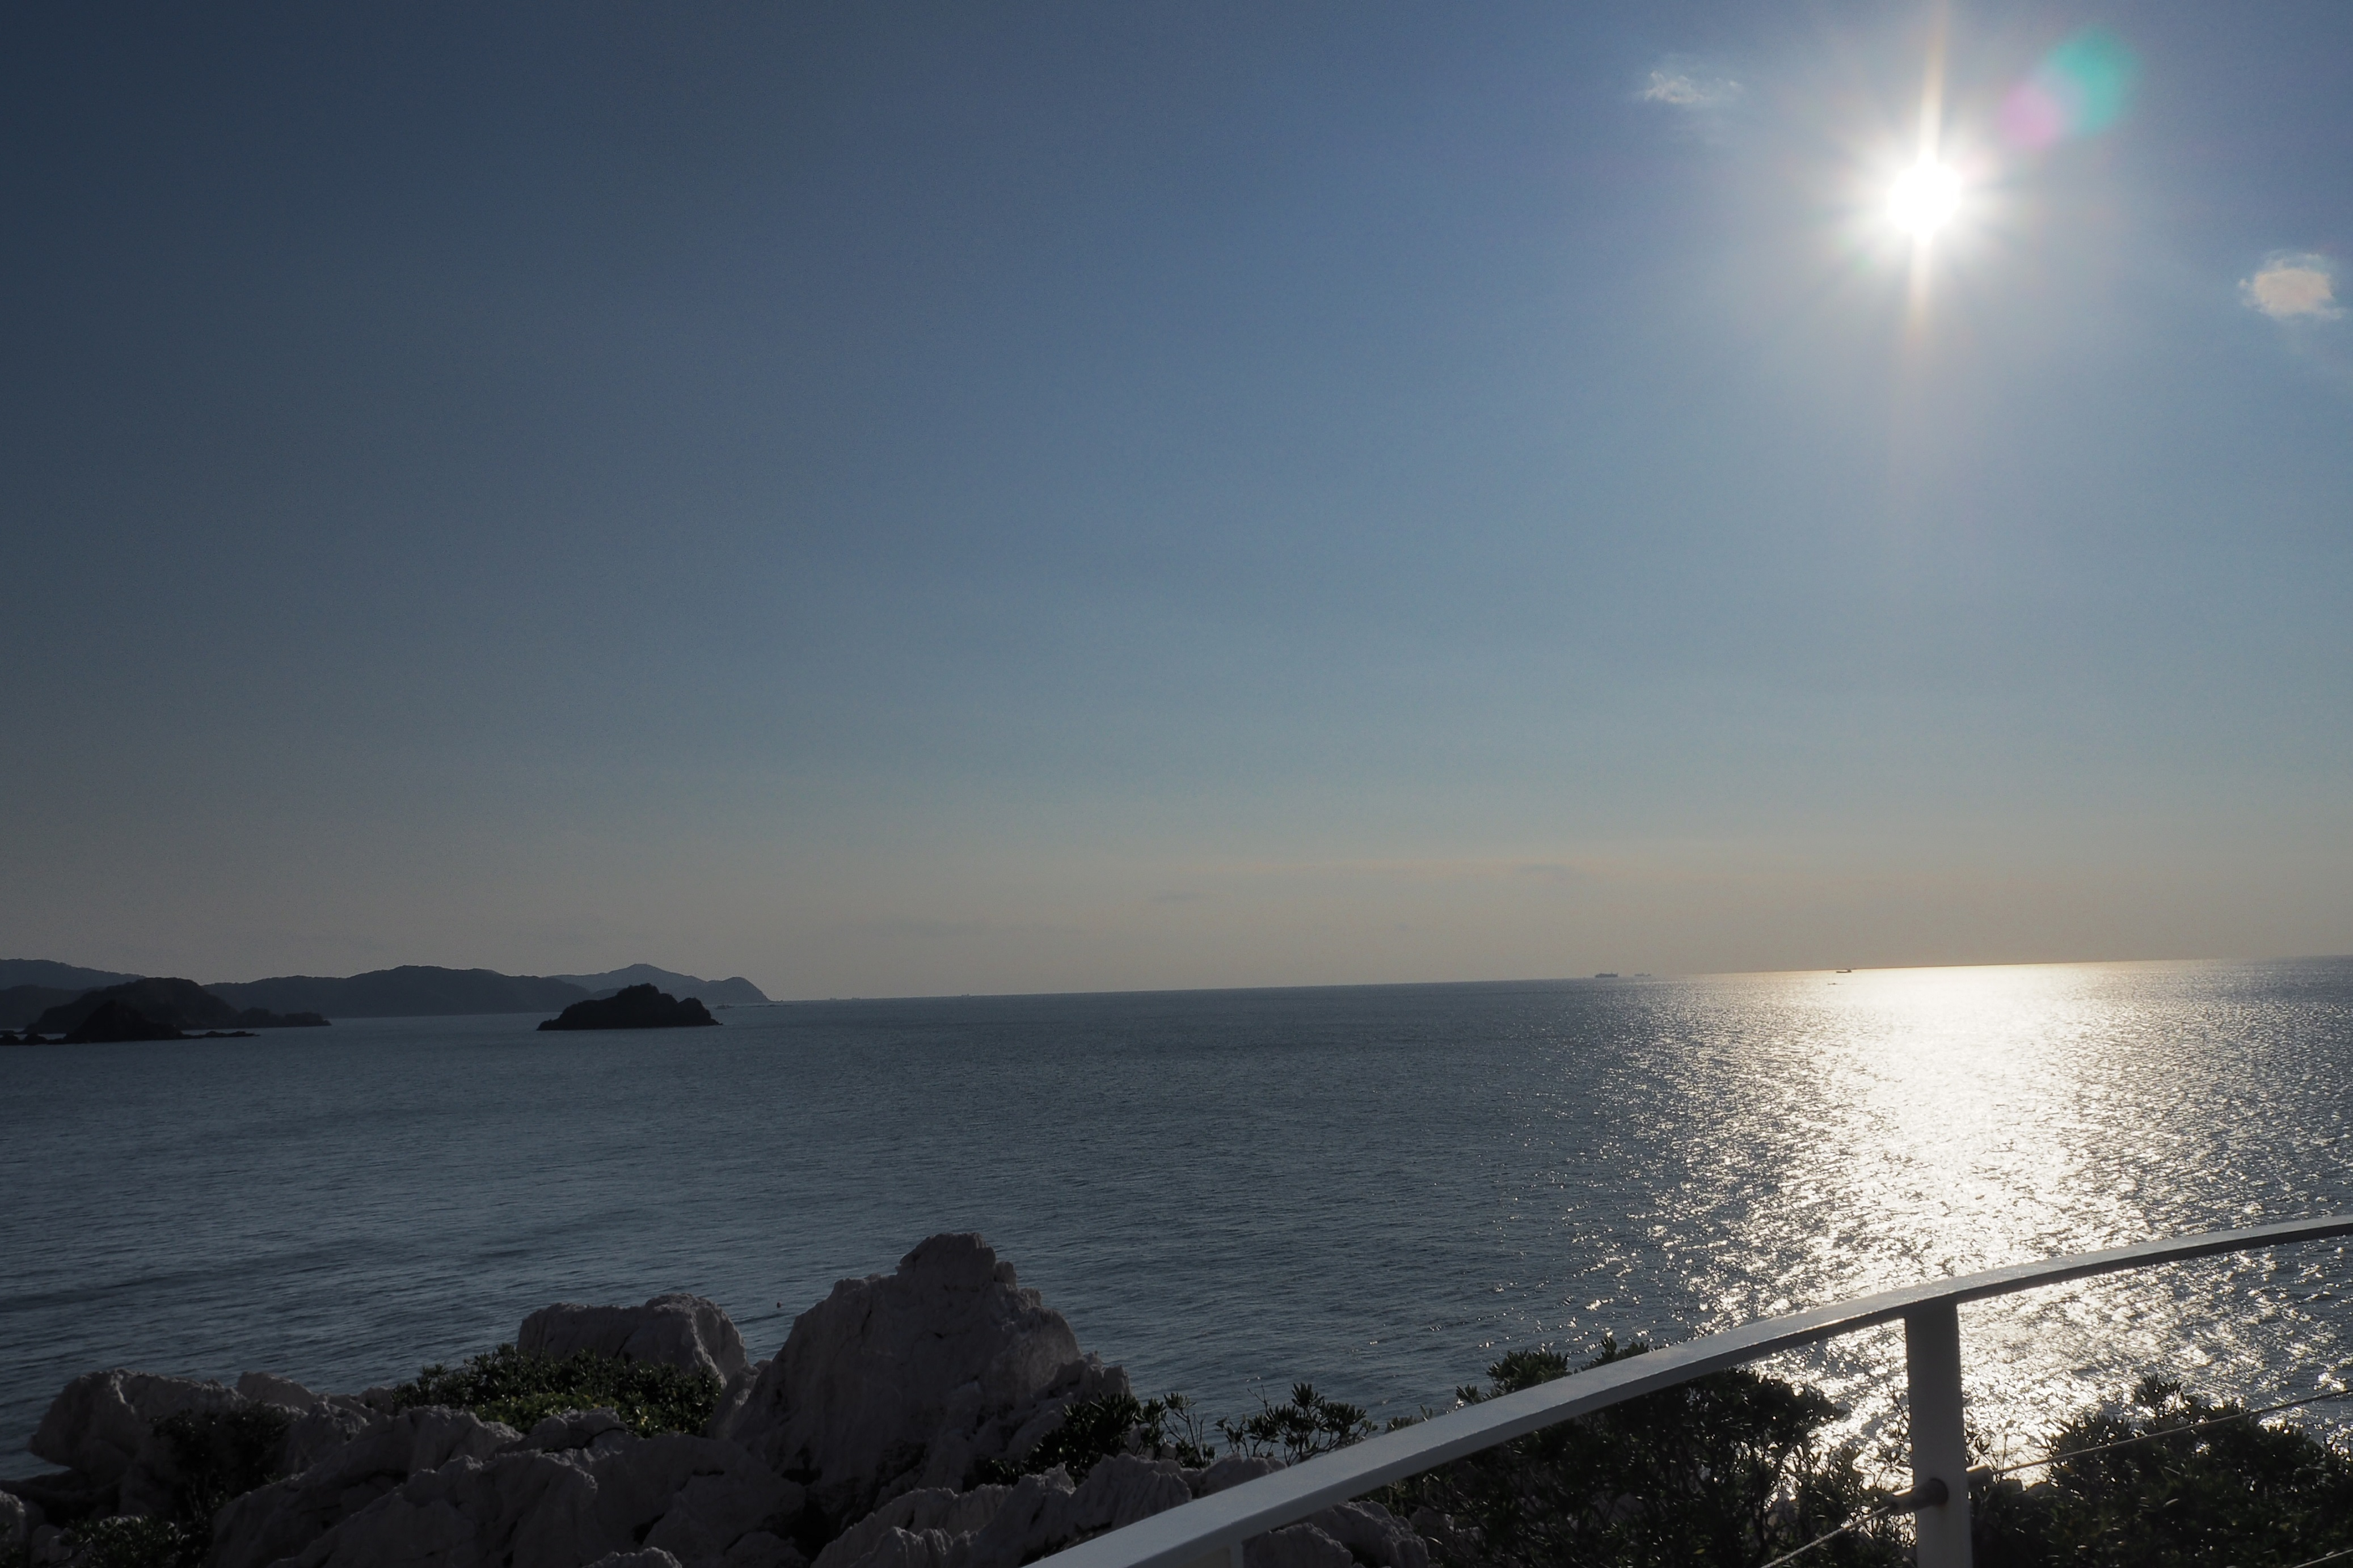 harleydavidson-motorcycle-touring-blog-shirasakioceanpark-limestone-observatory-oceanview.jpg